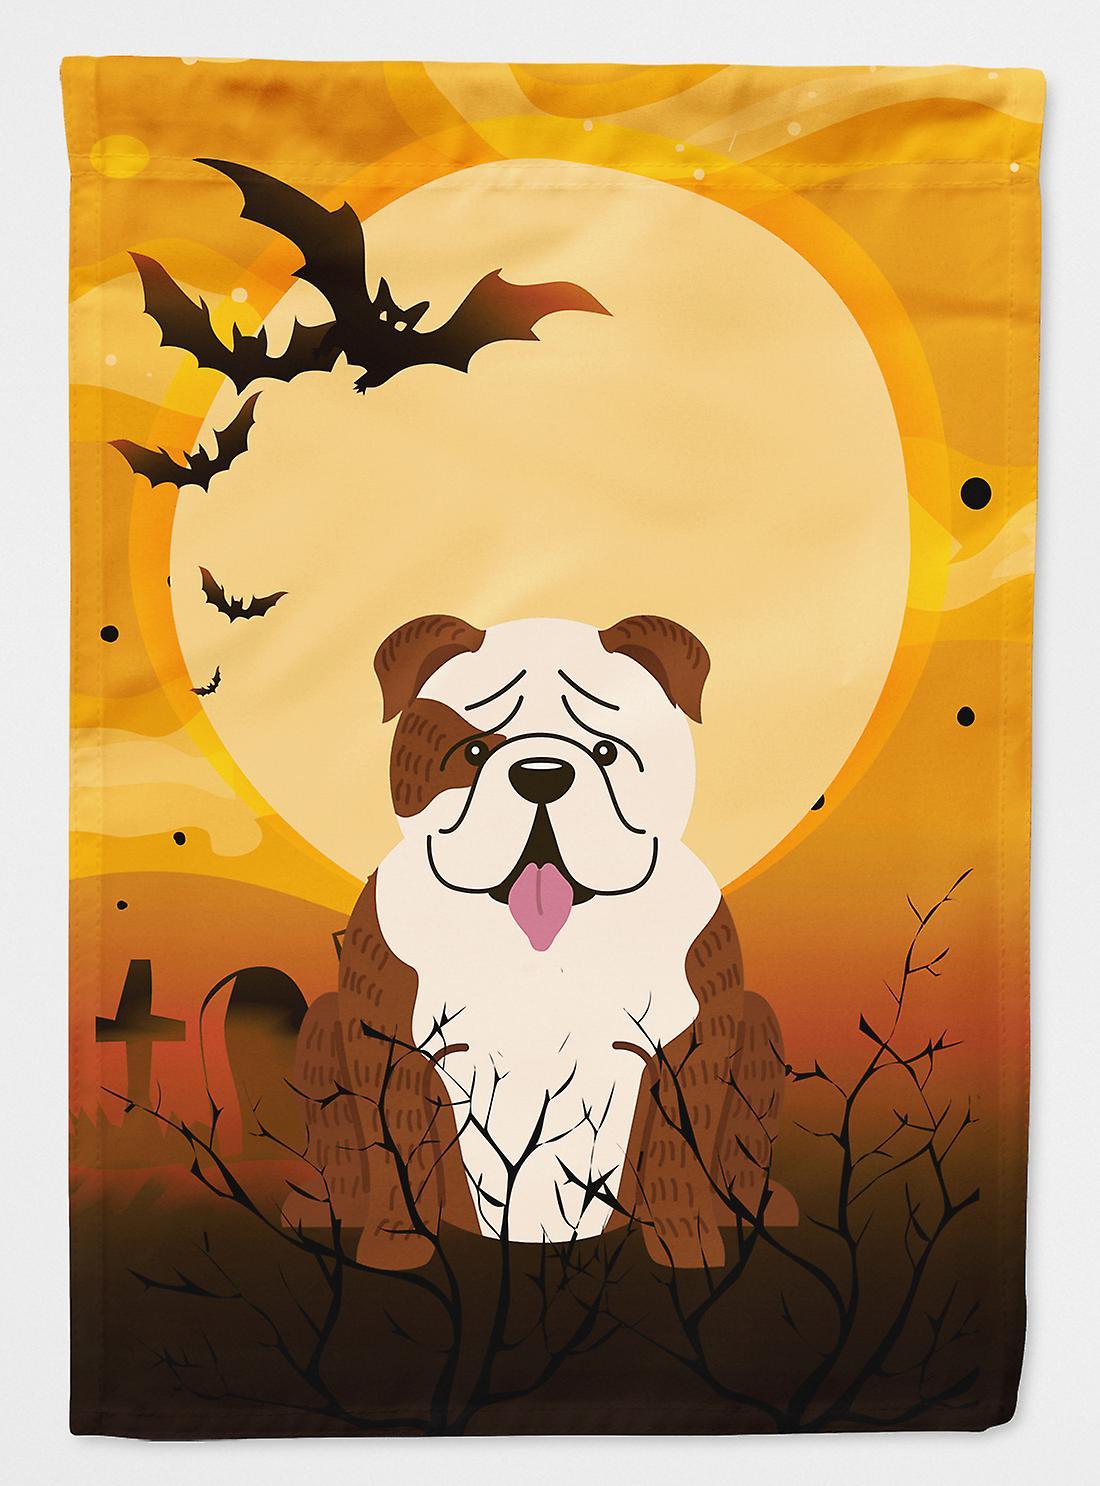 Halloween anglais Bulldog bringé drapeau blanc Taille du canevas maison